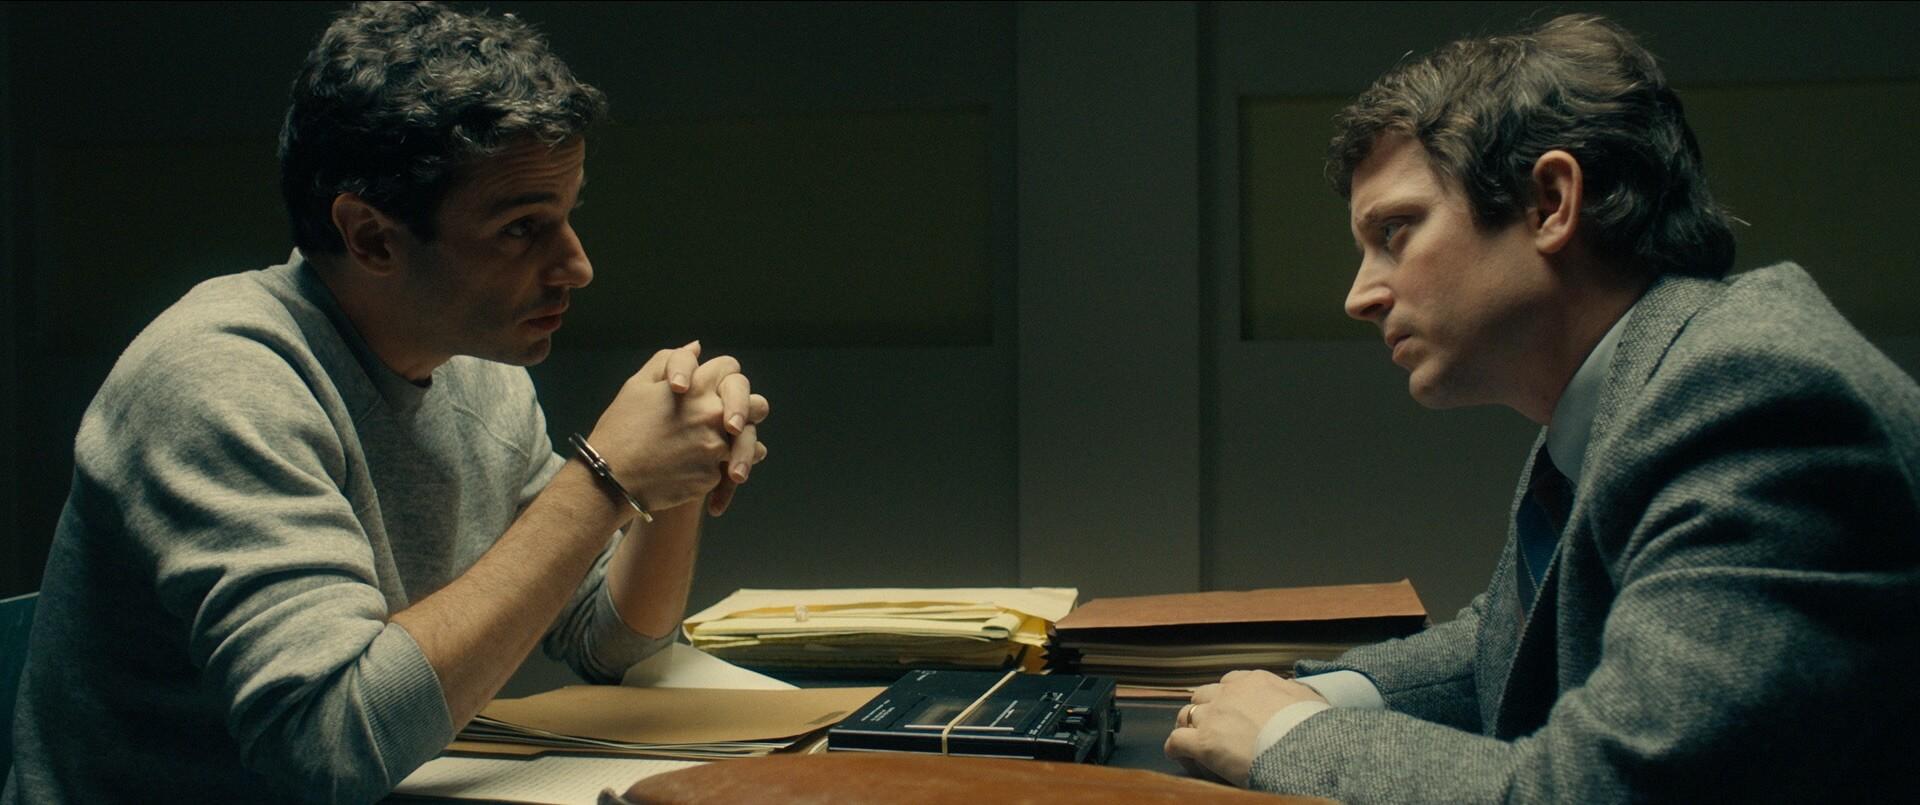 Luke Kirby as Ted Bundy and Elijah Wood as FBI Agent Bill Hagmaier